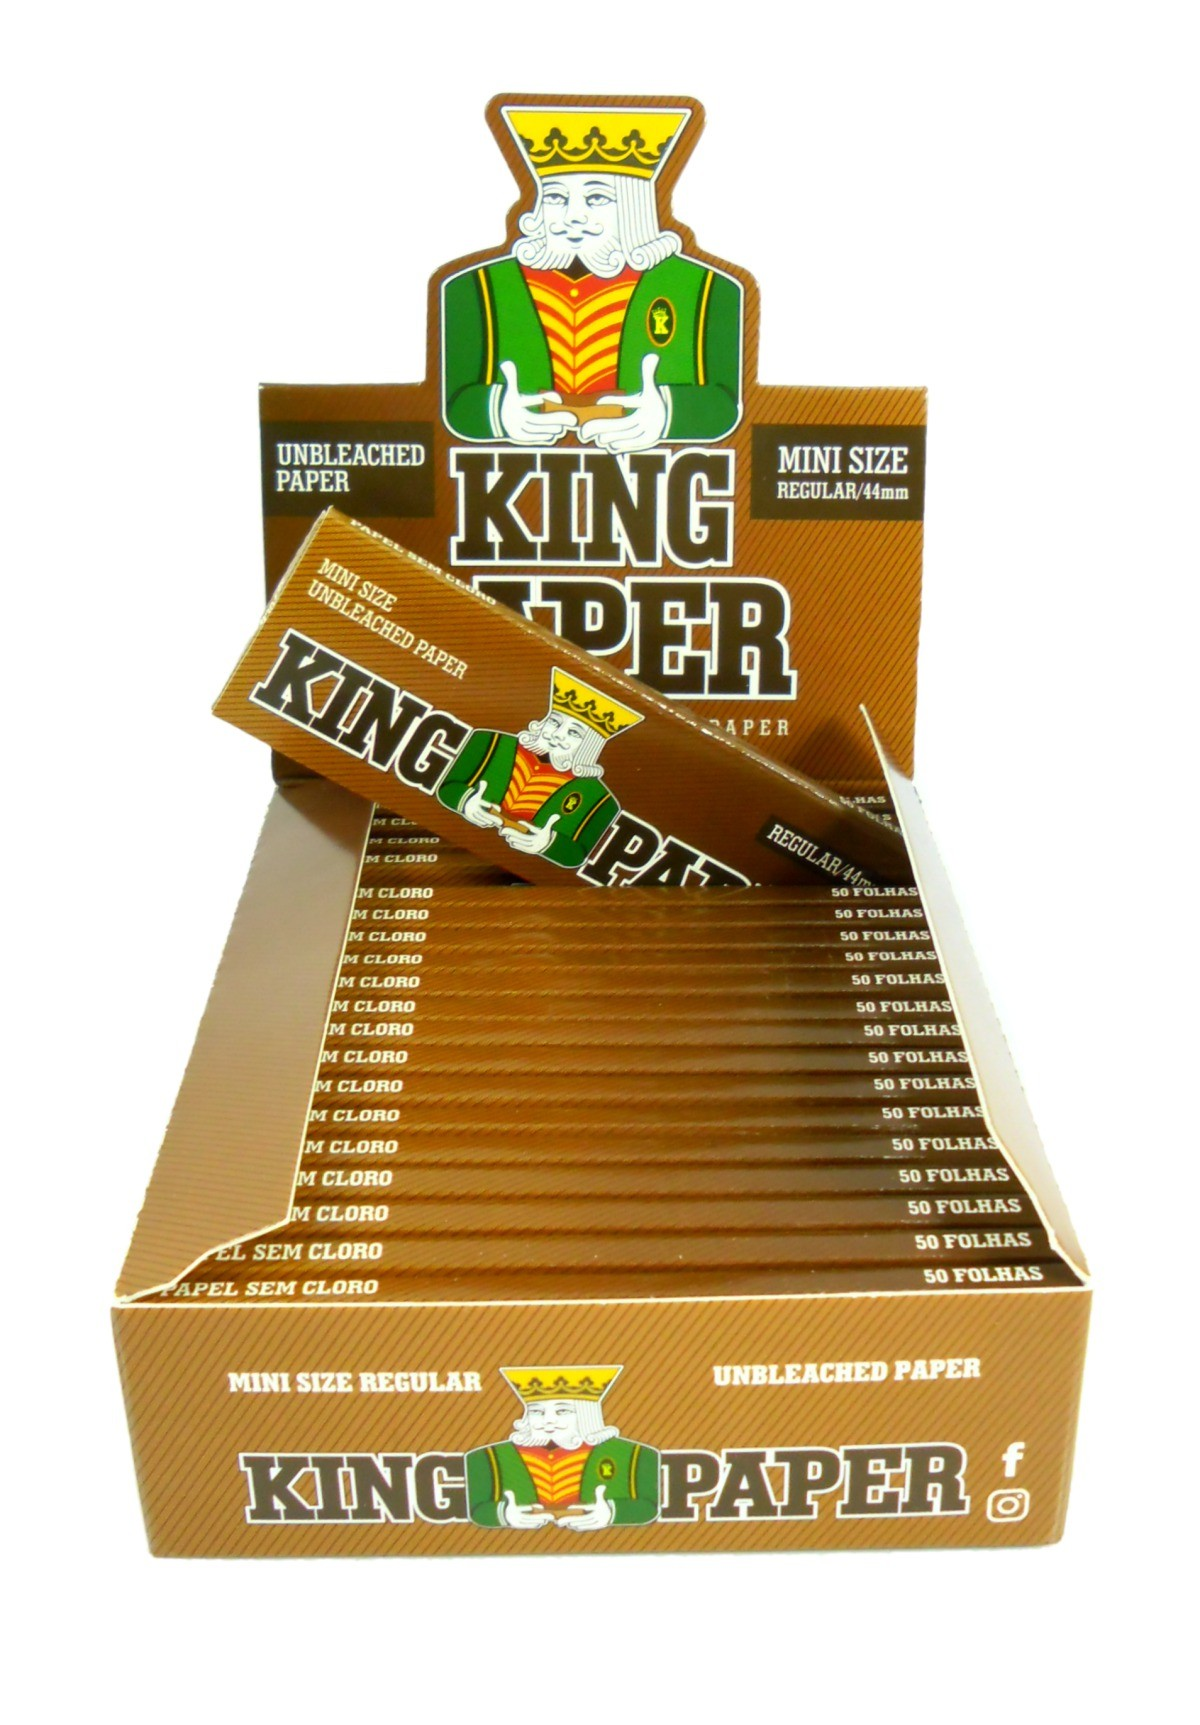 Seda King Paper Unbleached (MARROM). Tamanho Regular/Pequeno 78X44mm marca Aleda - LIVRO AVULSO 50 folhas